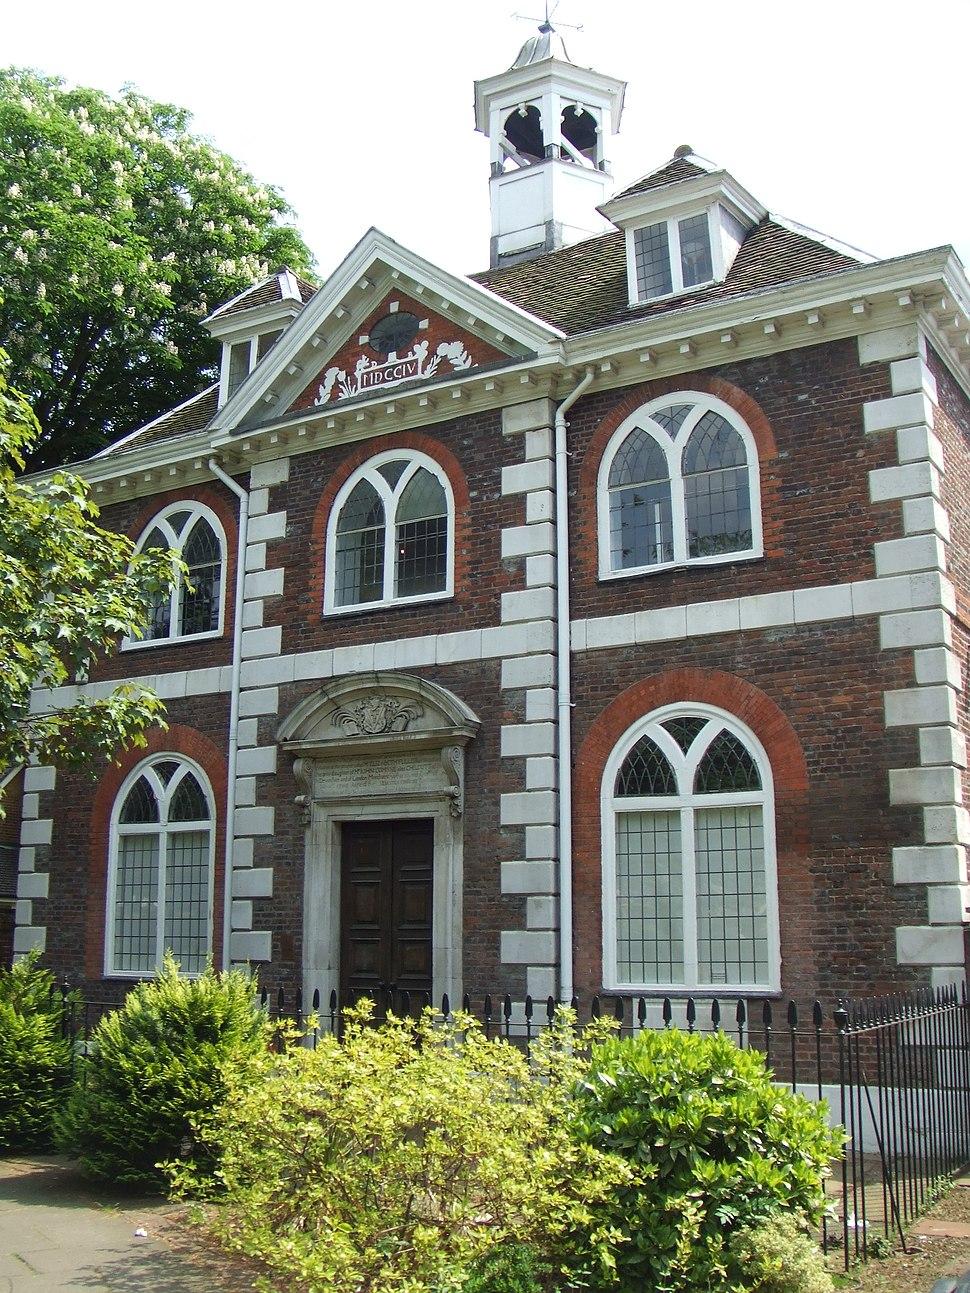 Watford Free School